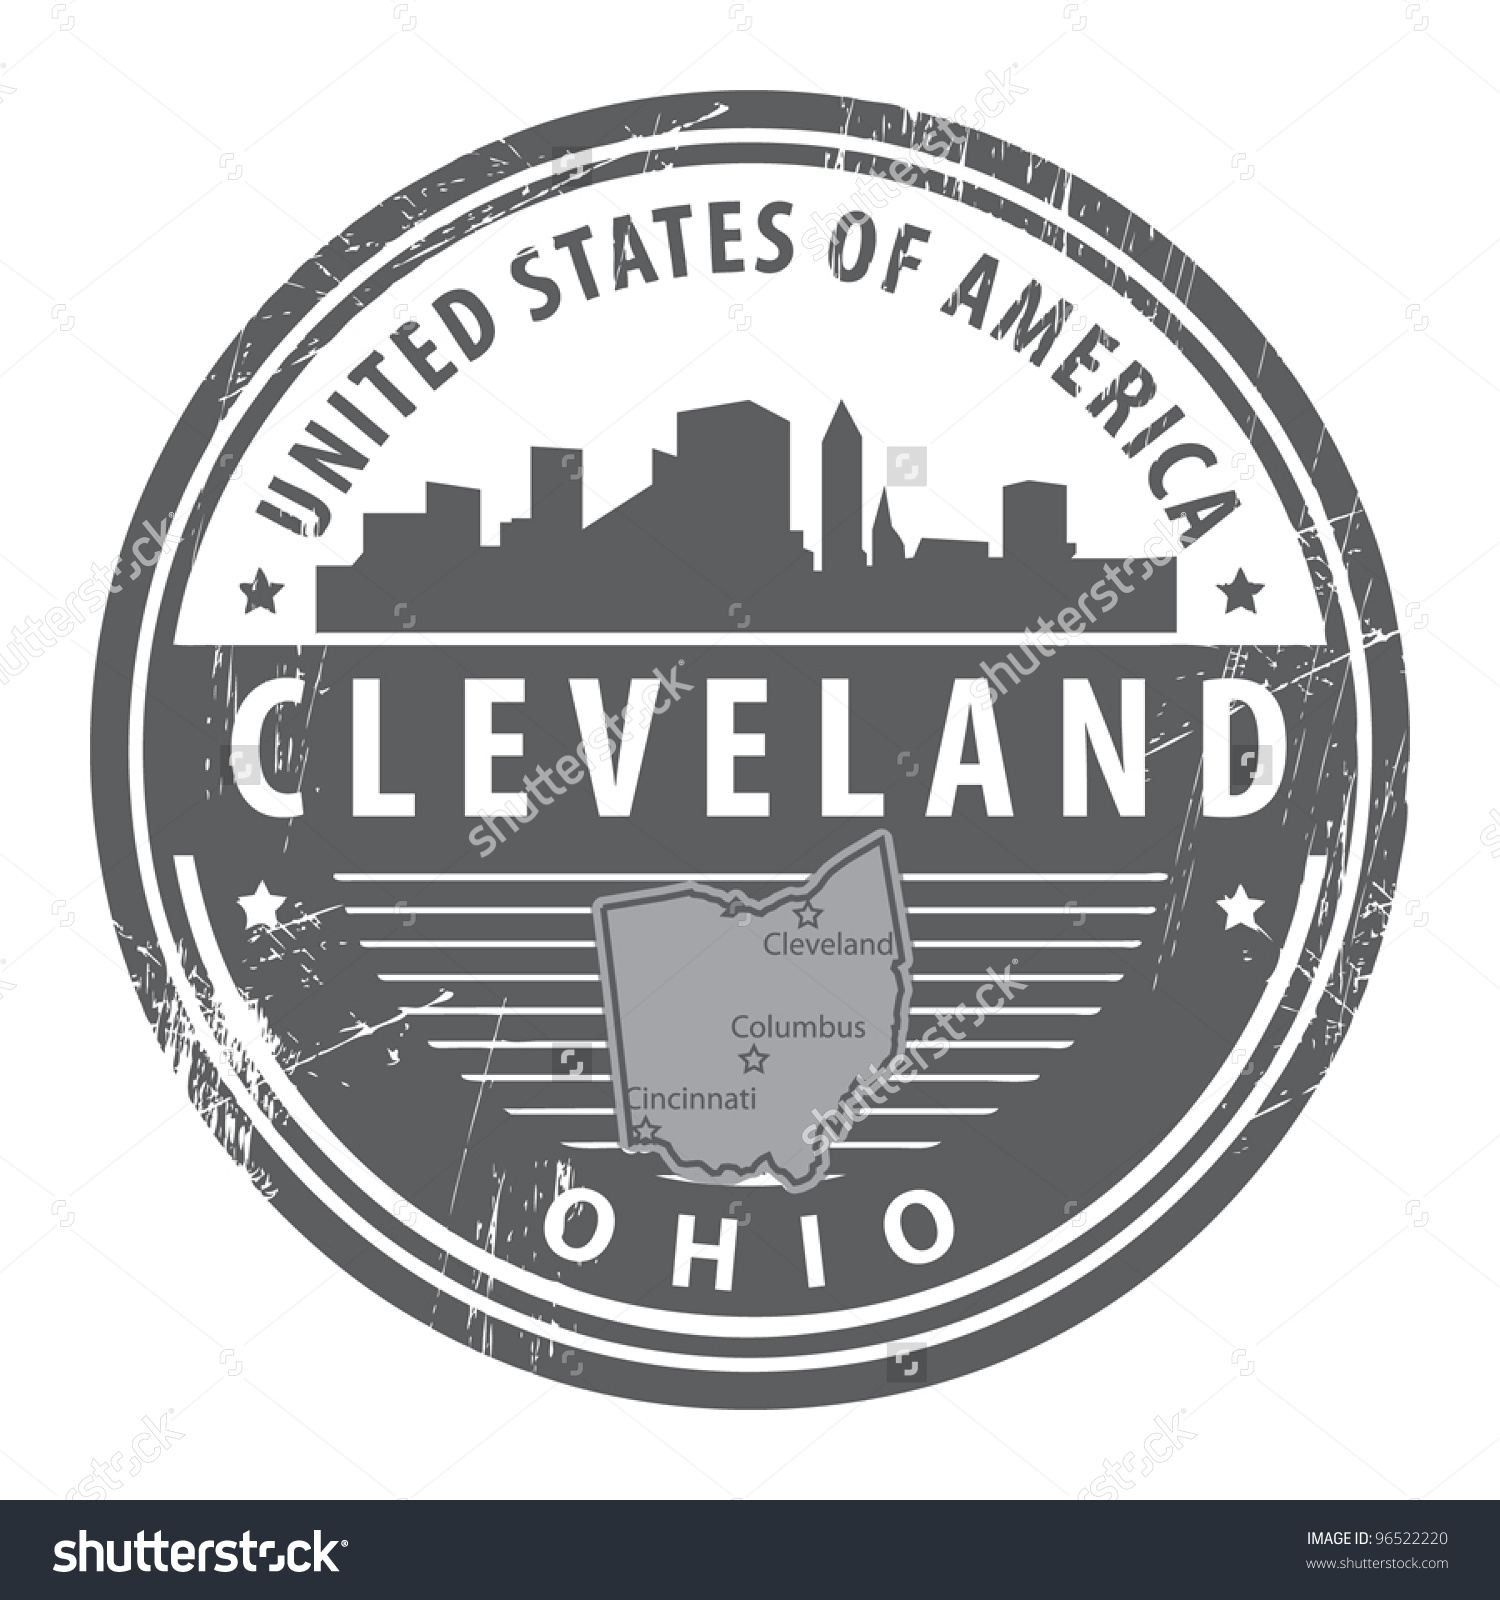 Cleveland ohio clipart.